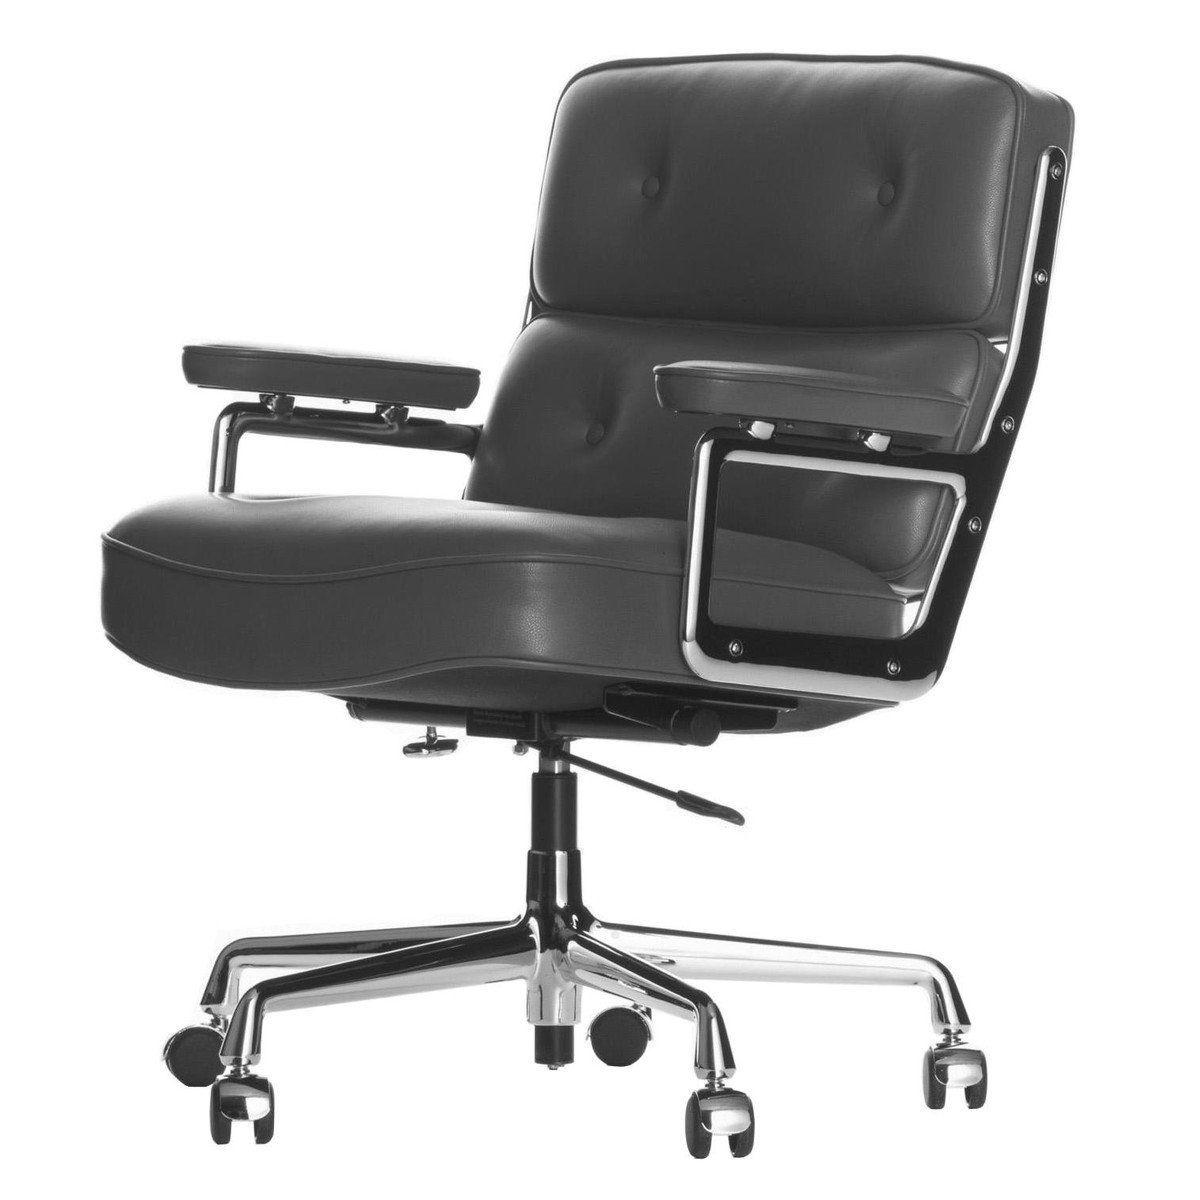 Eames Bürostuhl vitra es 104 eames lobby chair bürostuhl vitra ambientedirect com